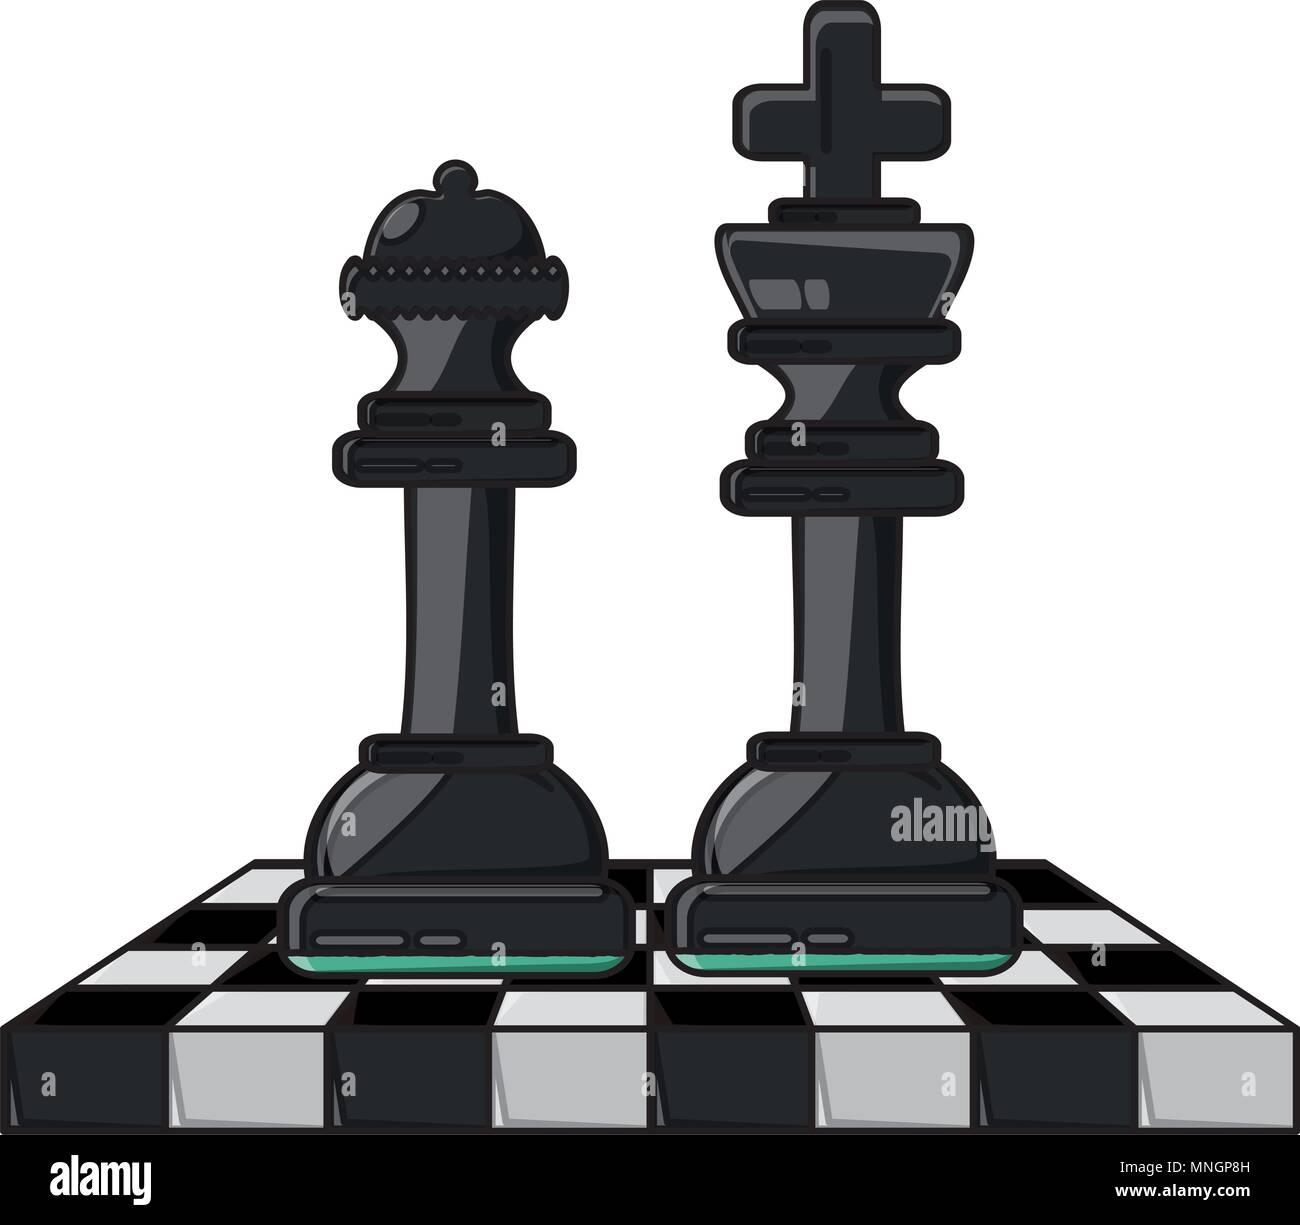 Silhouette King Queen Chess Pieces Stock Photos